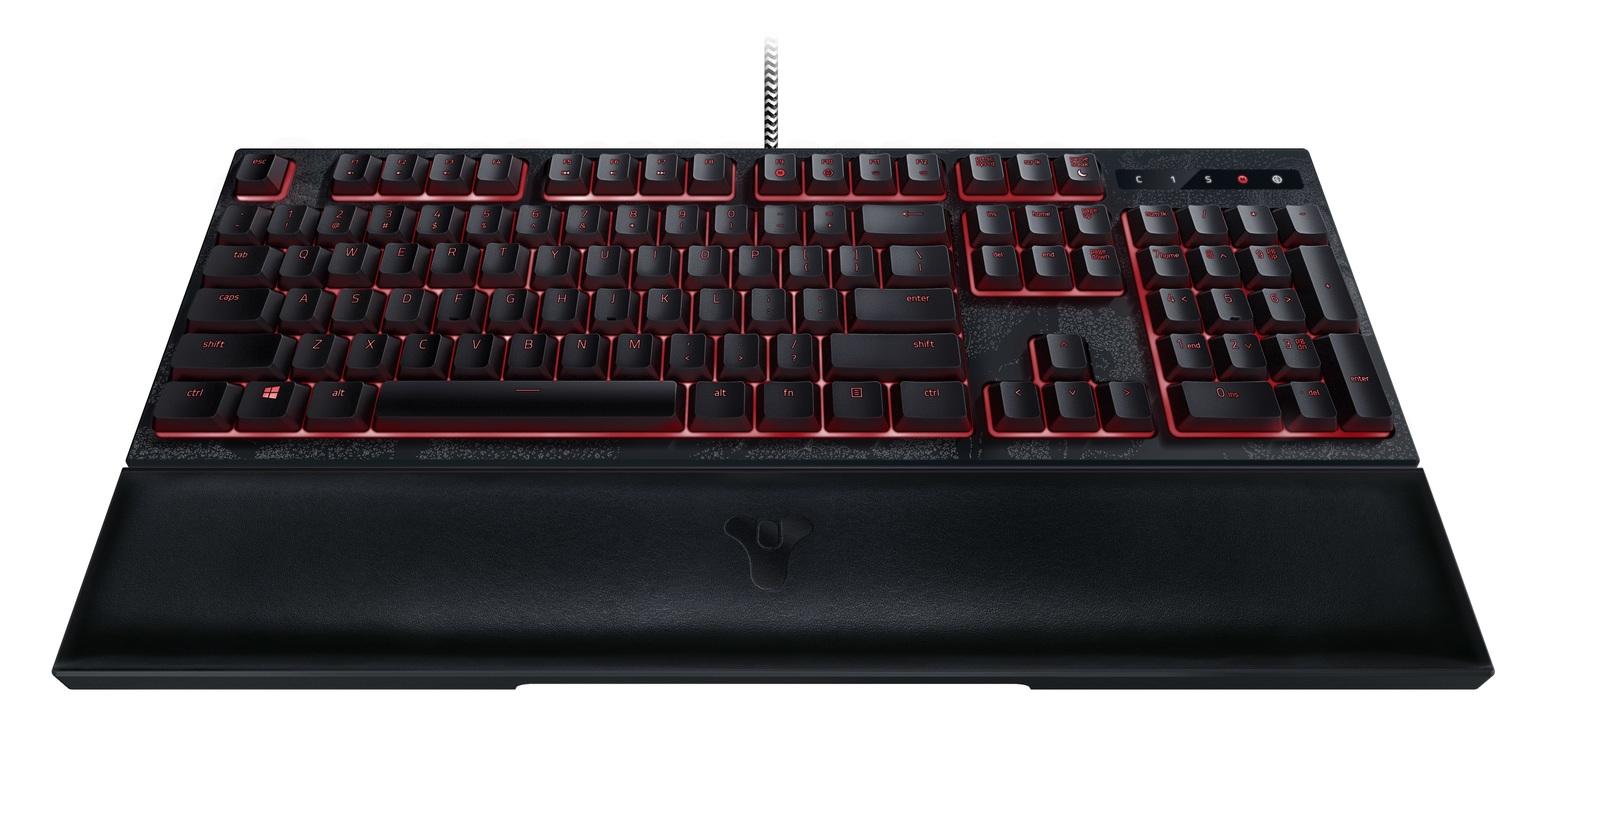 Destiny 2 Razer Ornata Chroma Gaming Keyboard for PC Games image